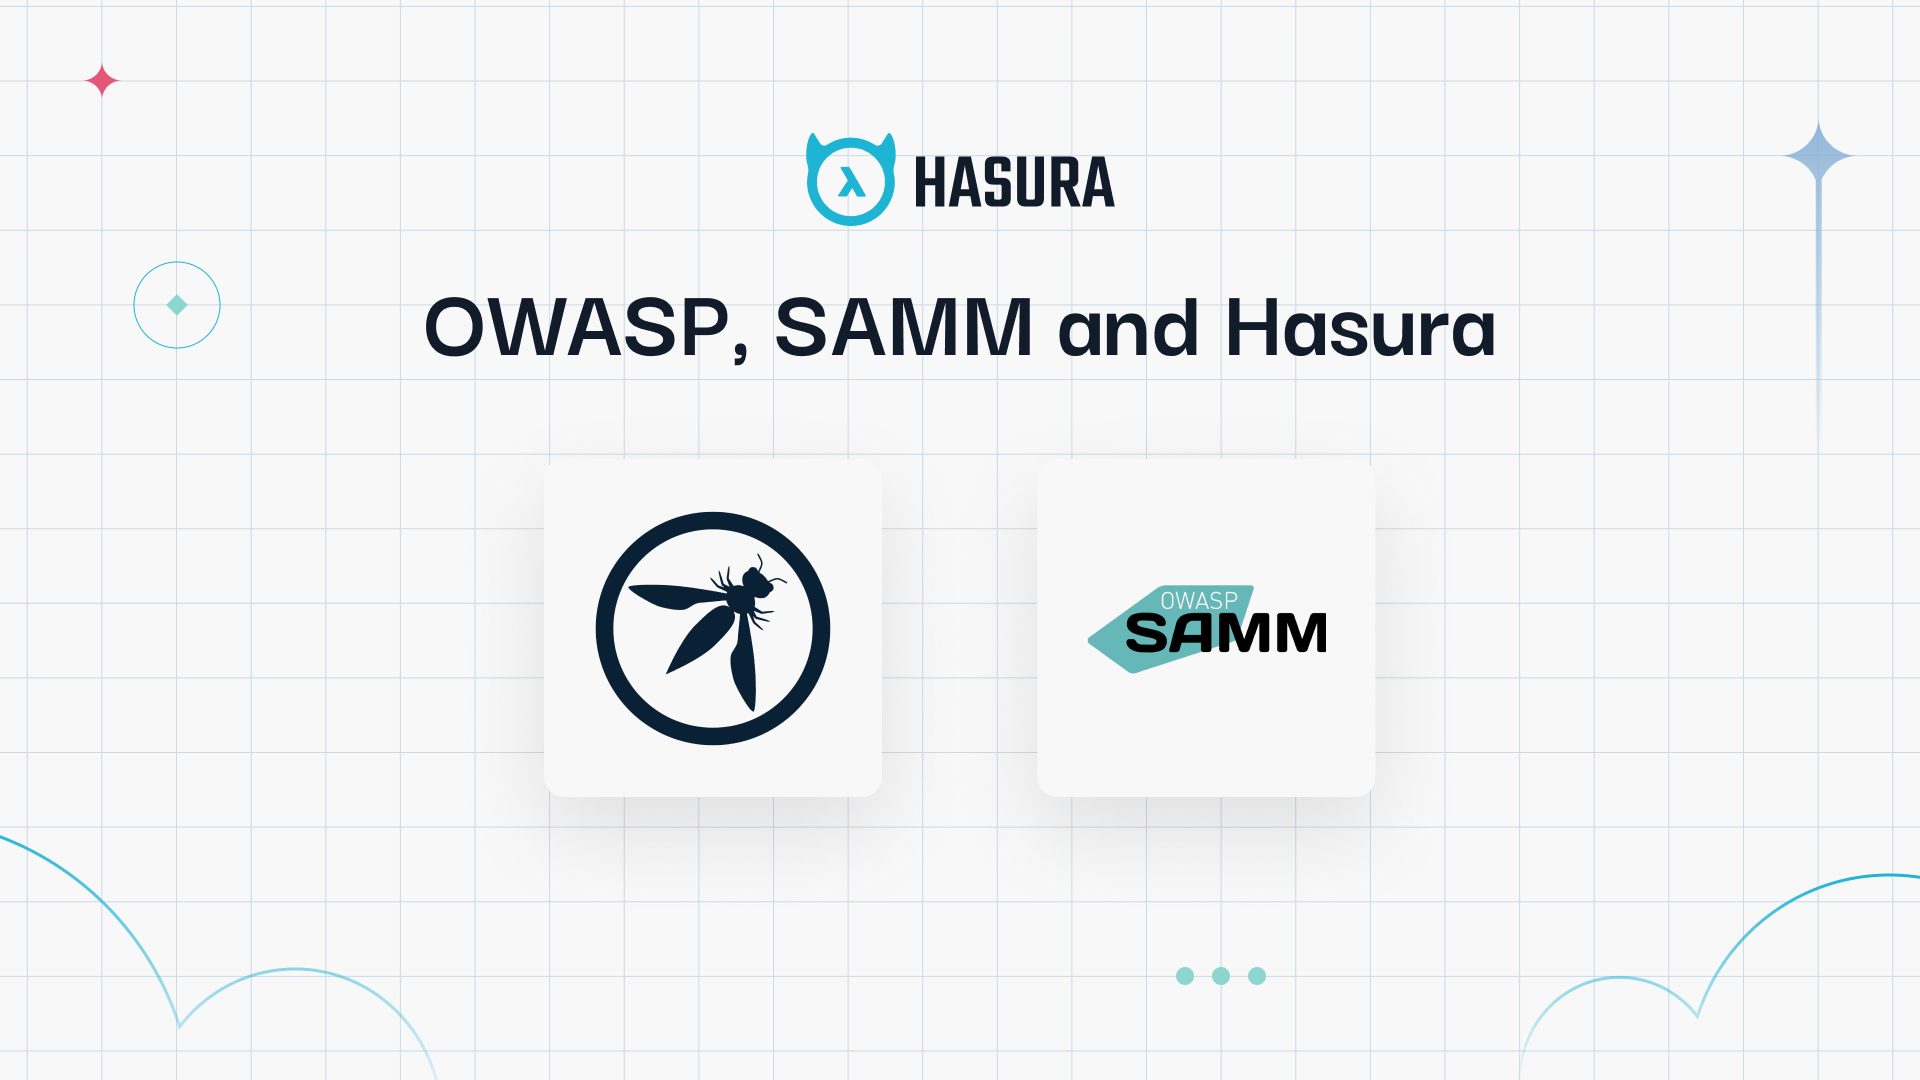 OWASP, SAMM and Hasura